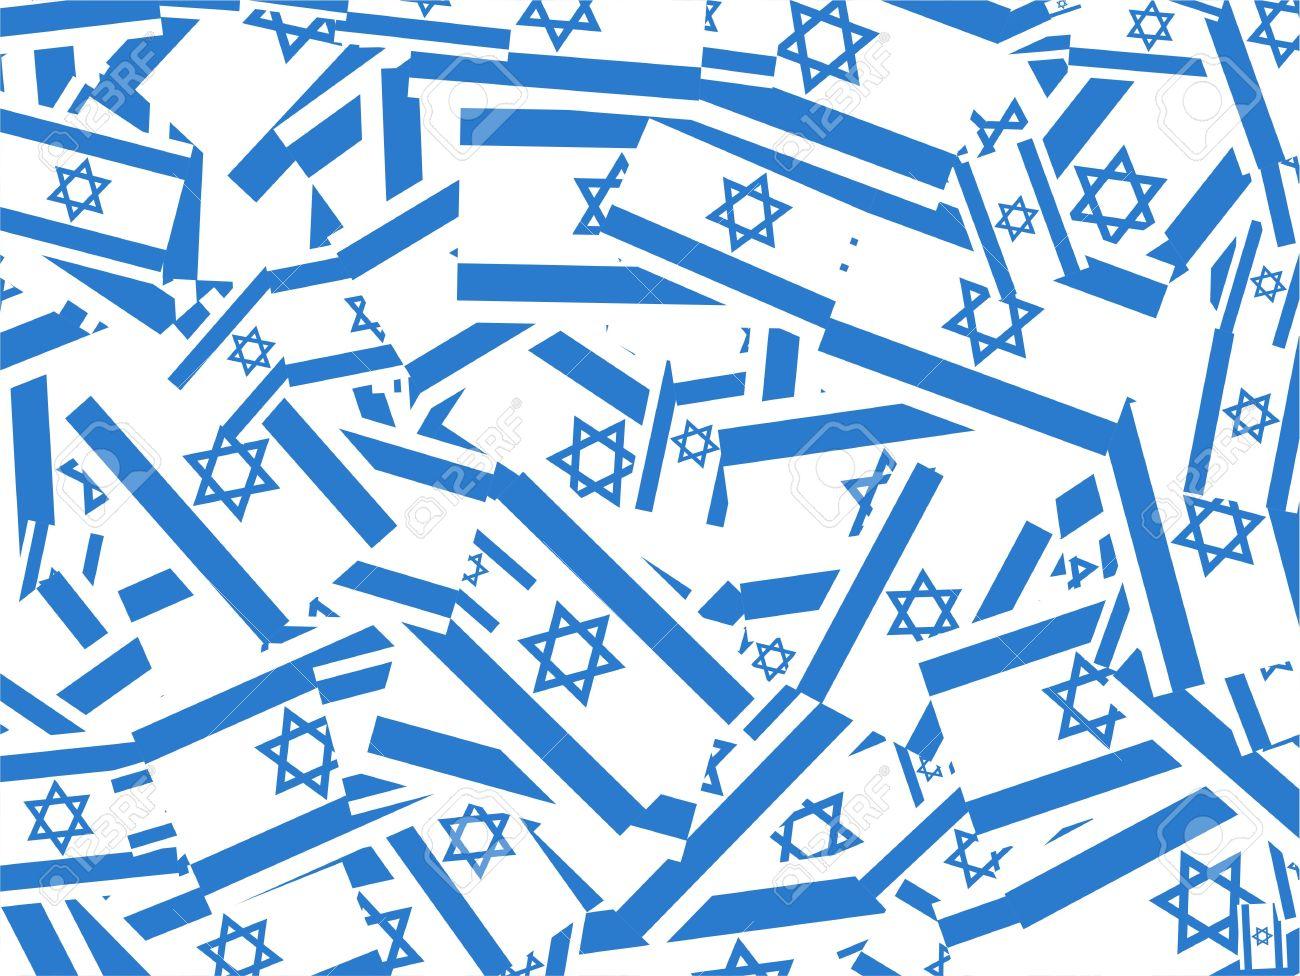 Jumbled up israeli flag wallpaper background design. Stock Photo - 3937589